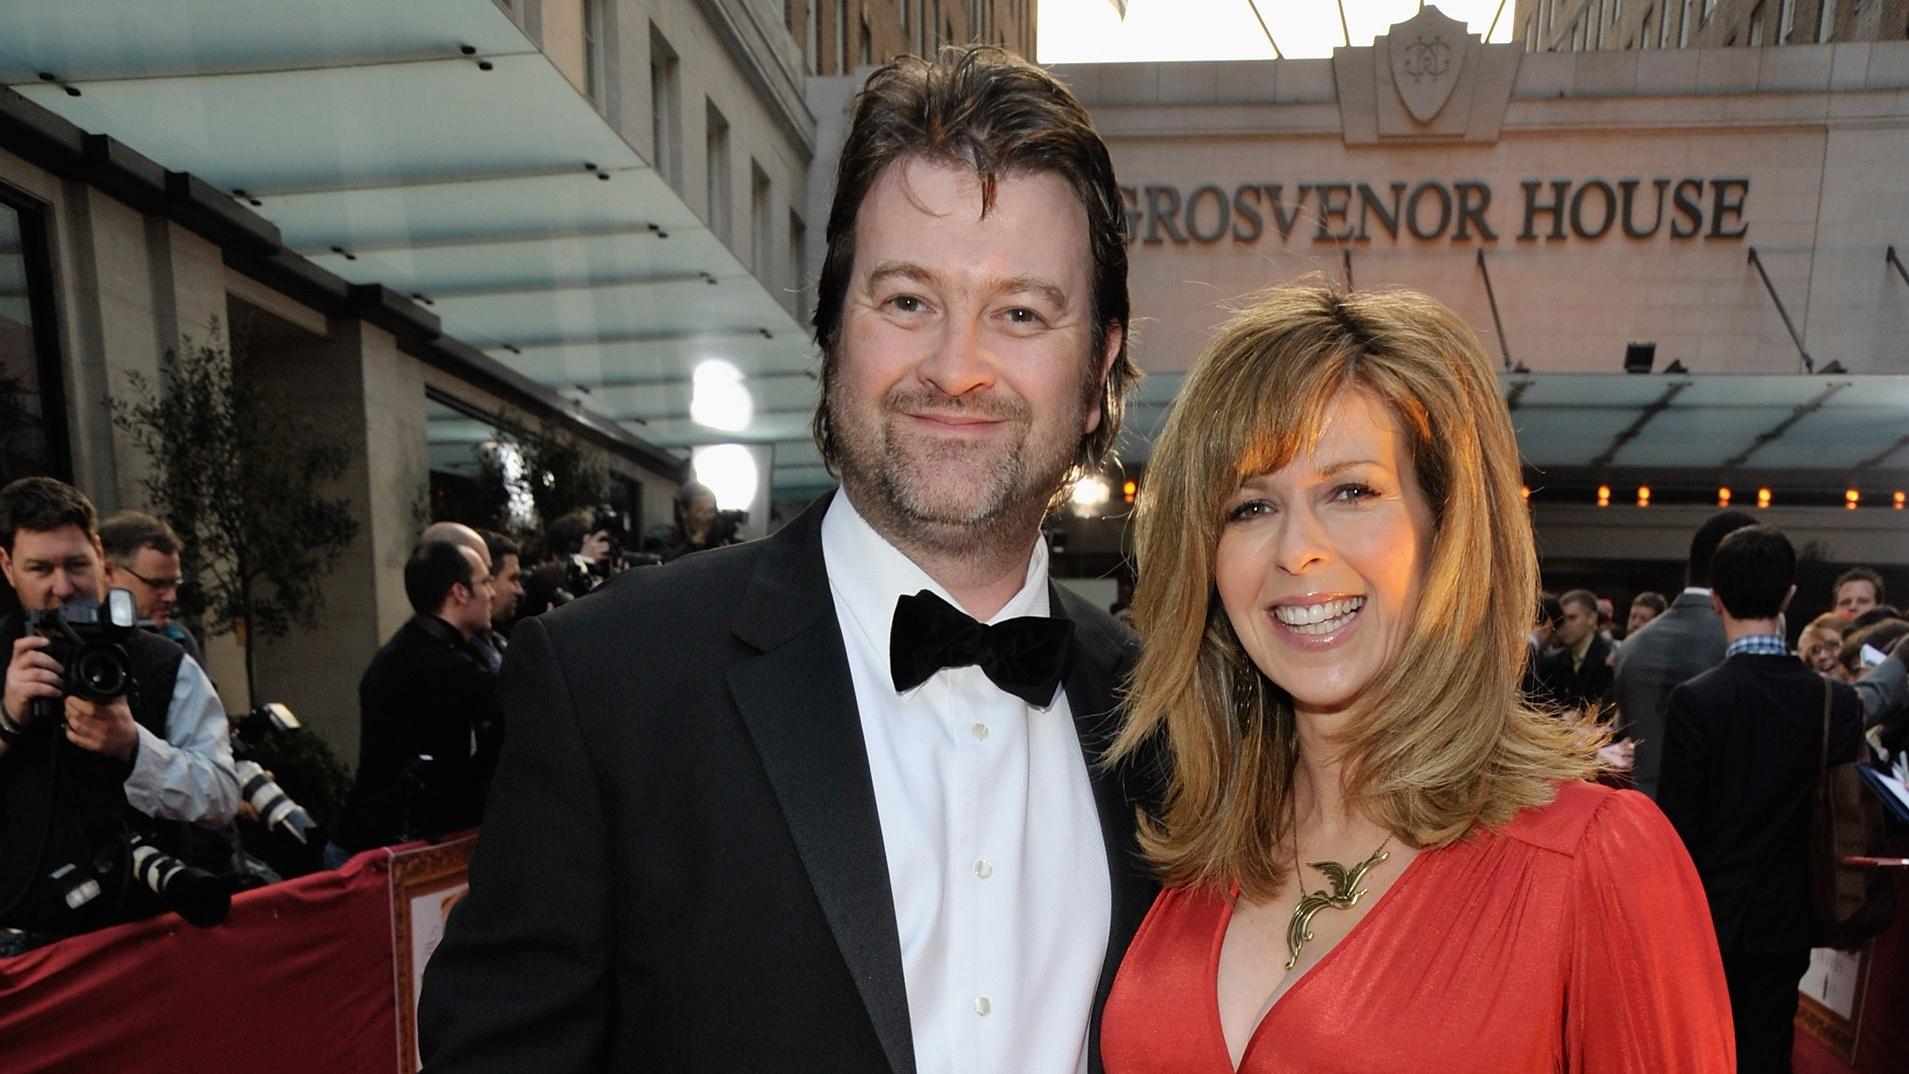 Kate Garraway and Derek Draper at the Galaxy British Book Awards in 2009 (Jon Furniss/WireImage)